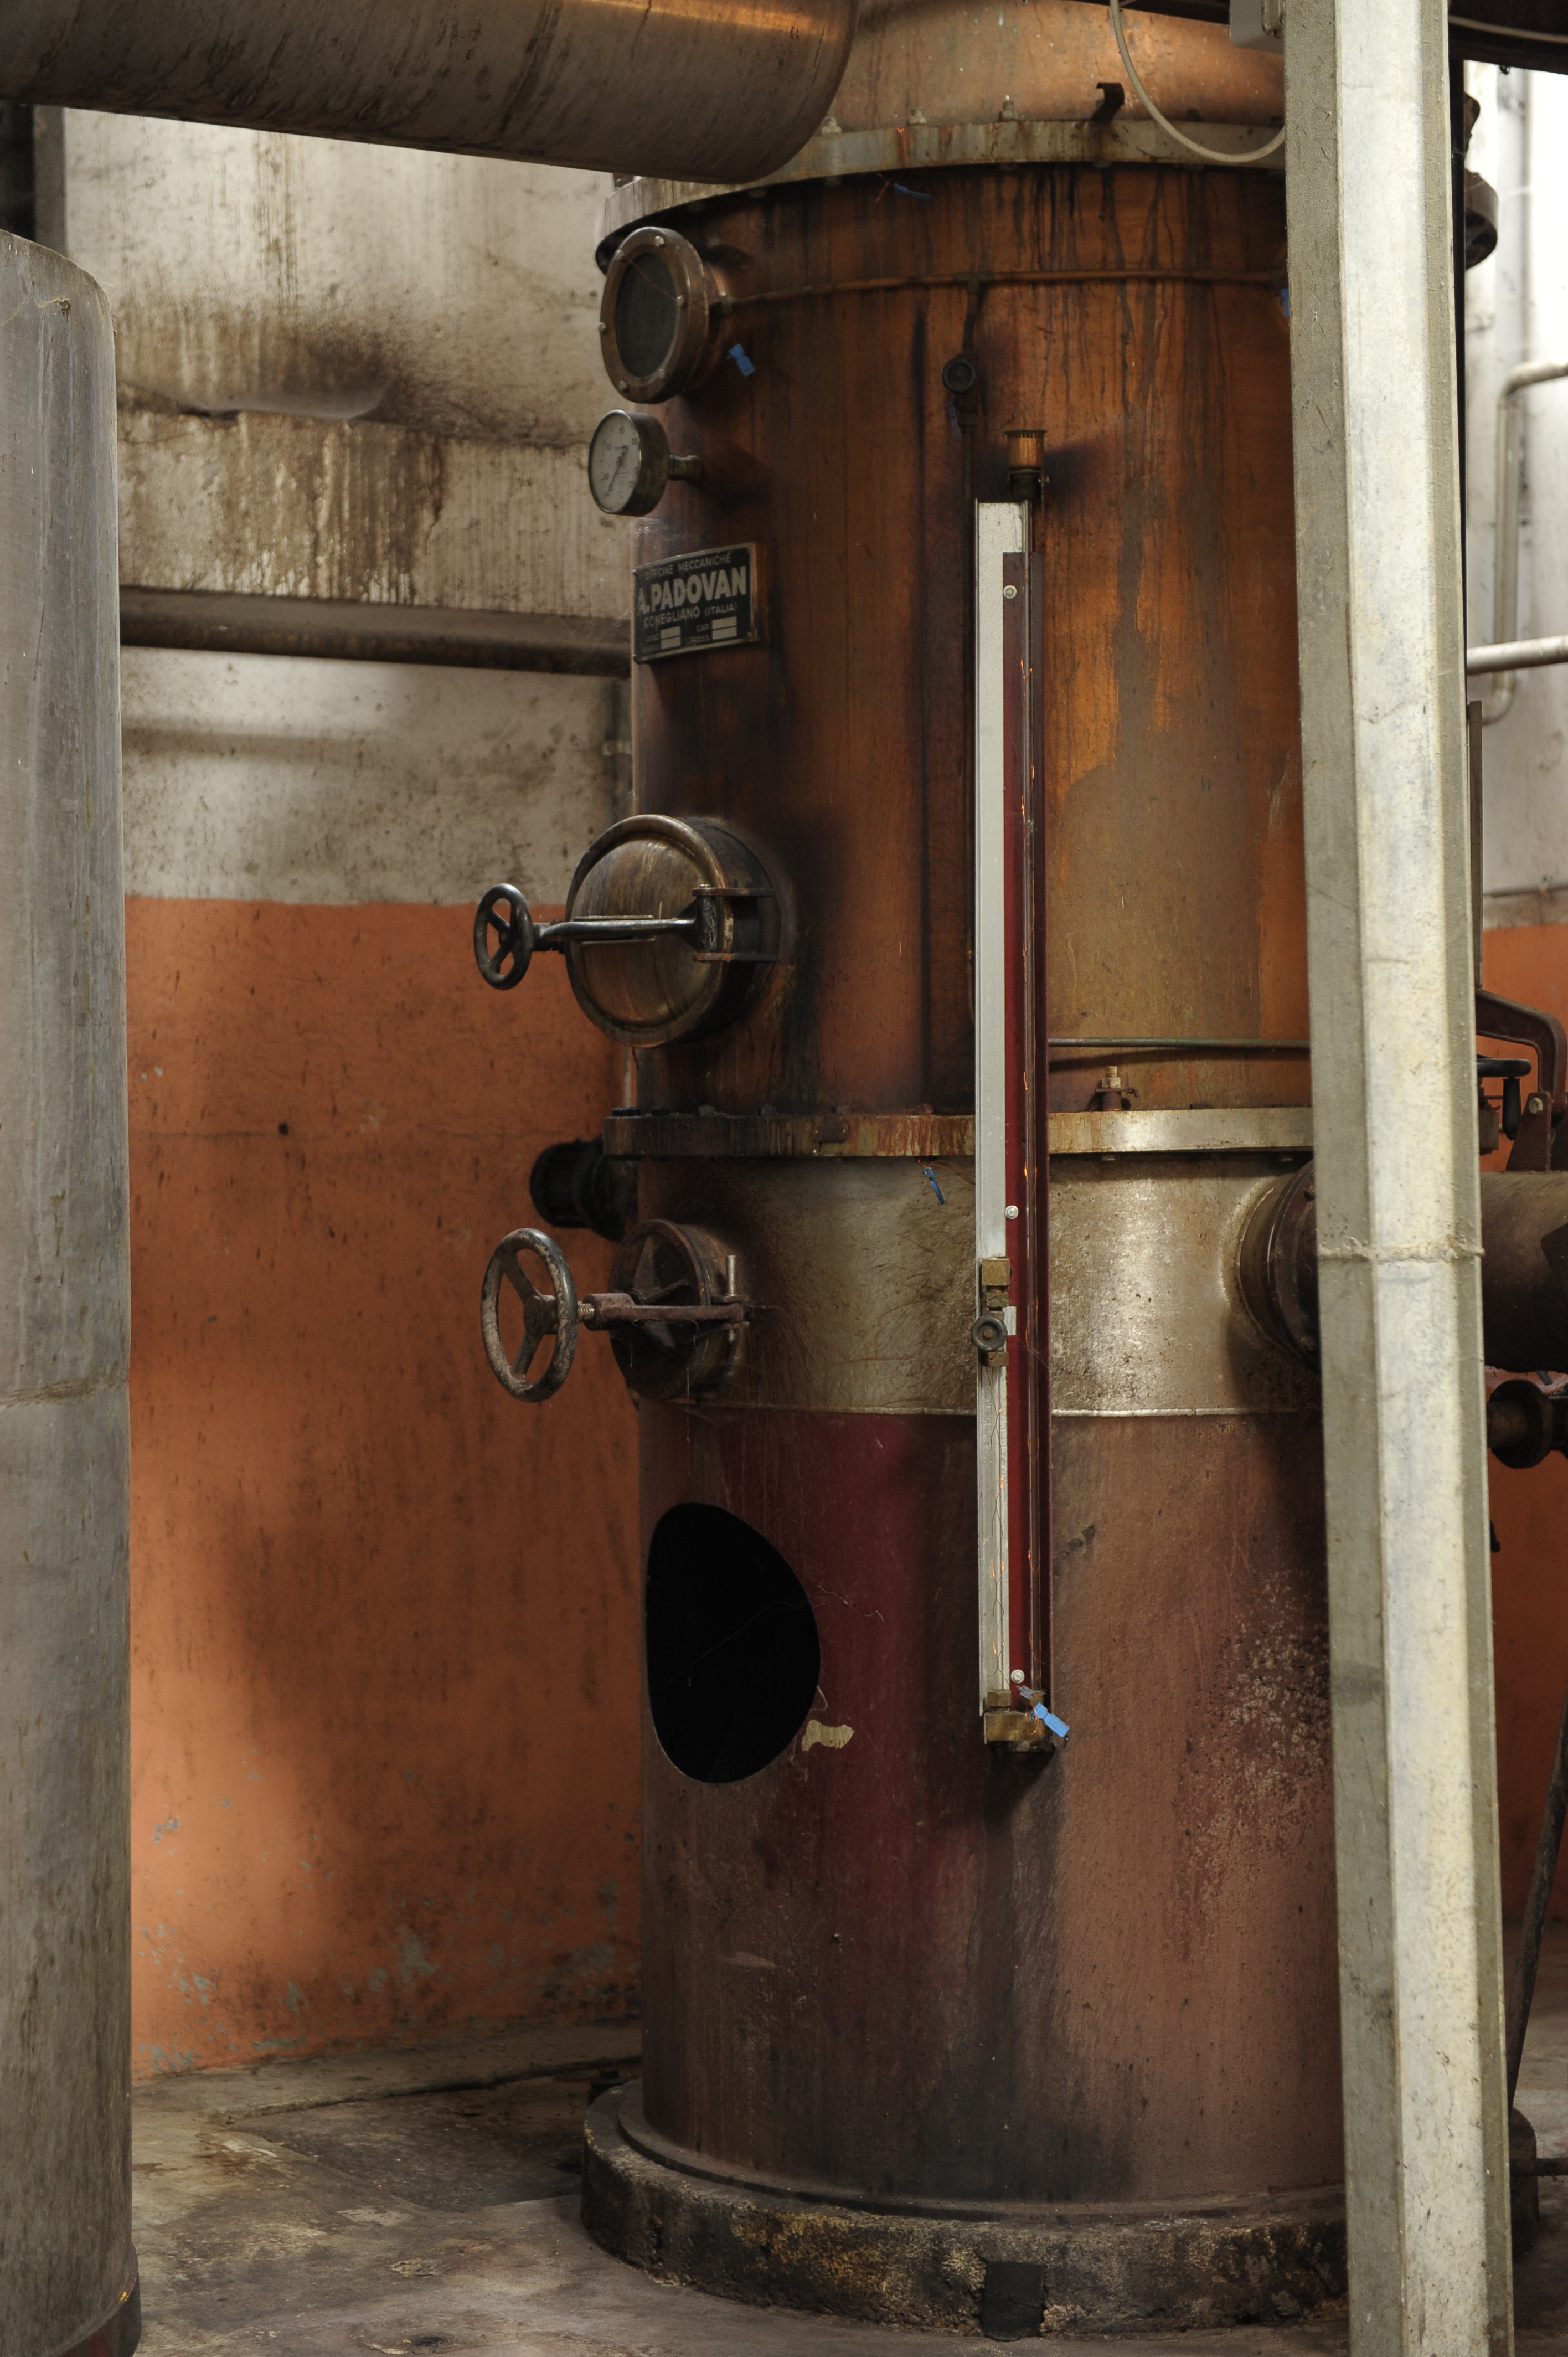 Distilleria castelli giuseppepiemonte cuneo cortemilia zoom cucina - Corsi cucina cuneo ...